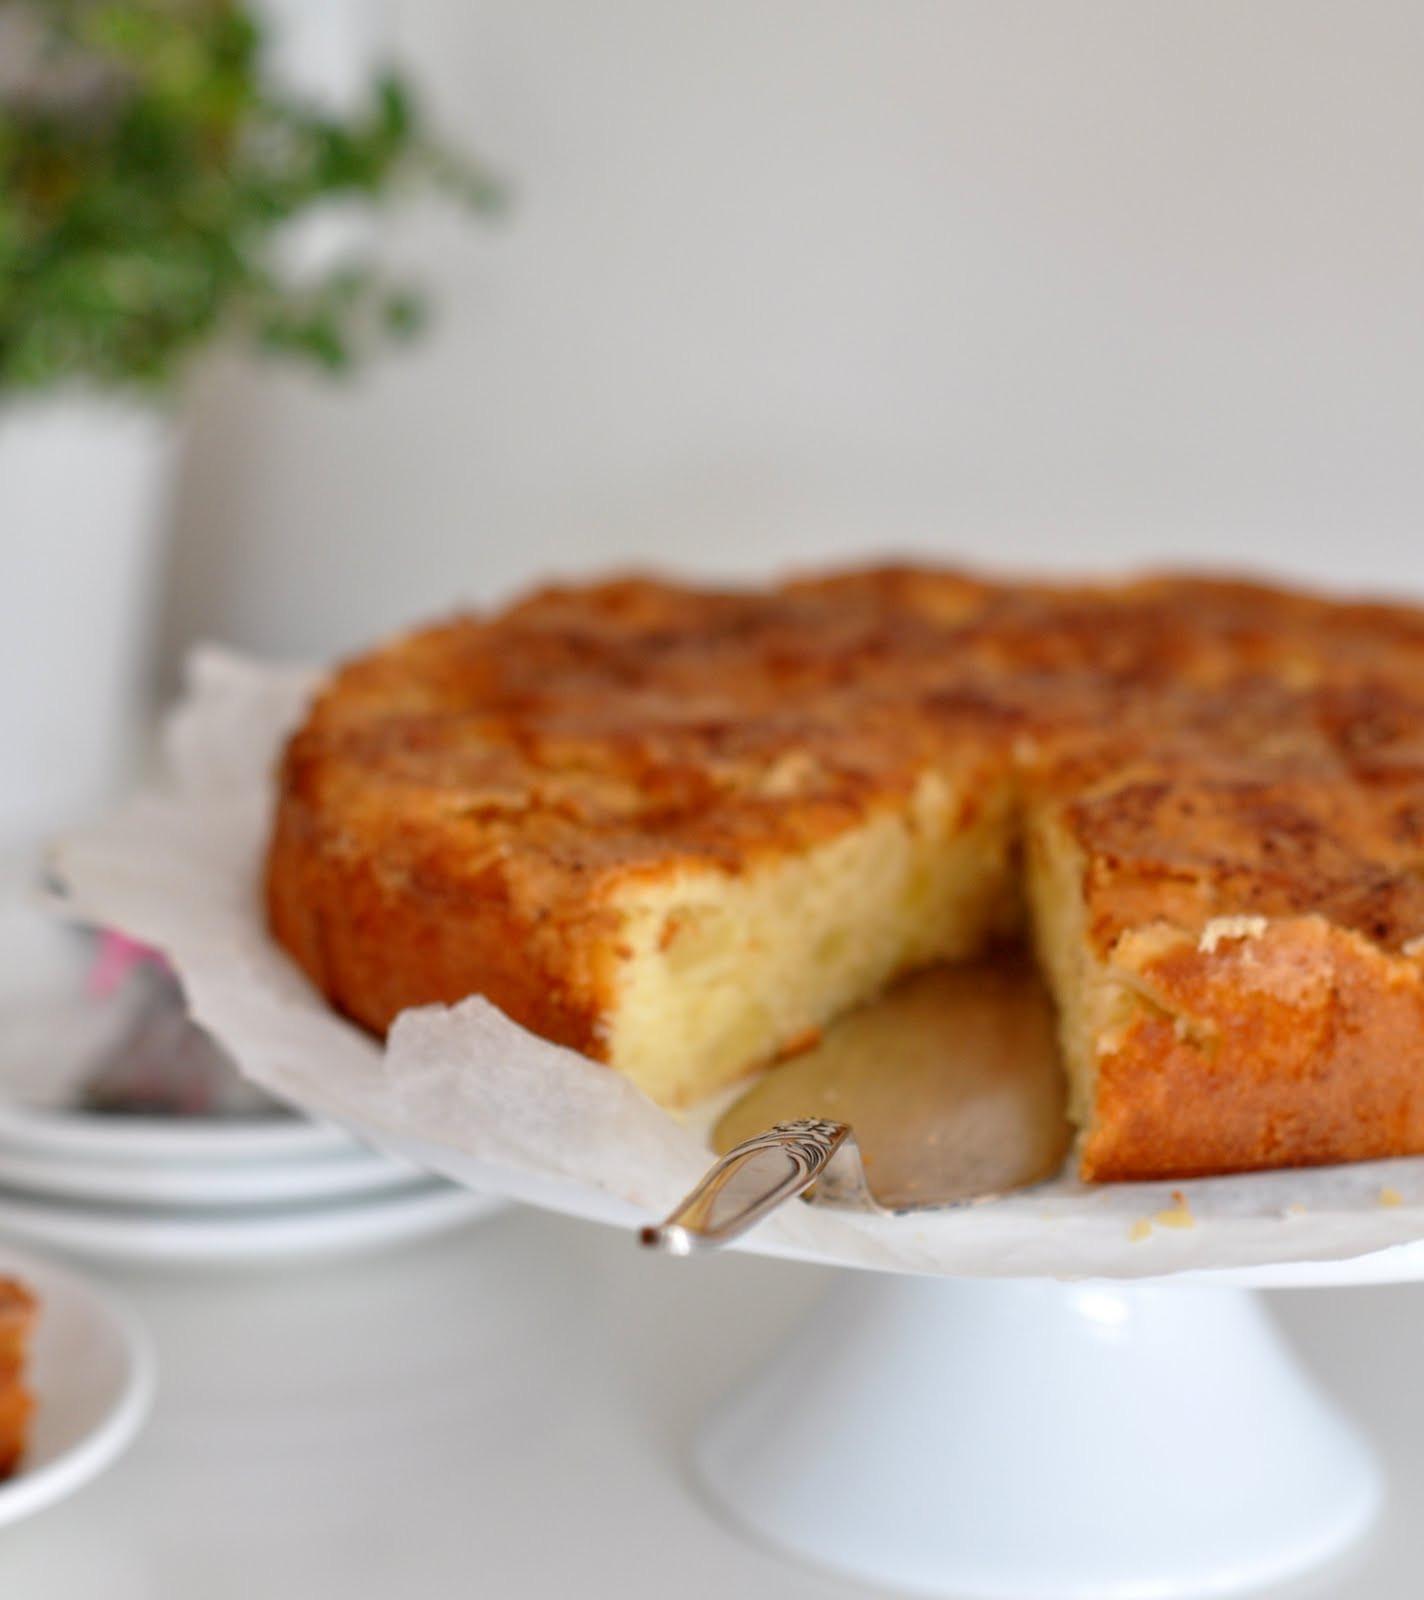 Apple Pie With Cheese  agata s kitchen Cottage cheese apple pie